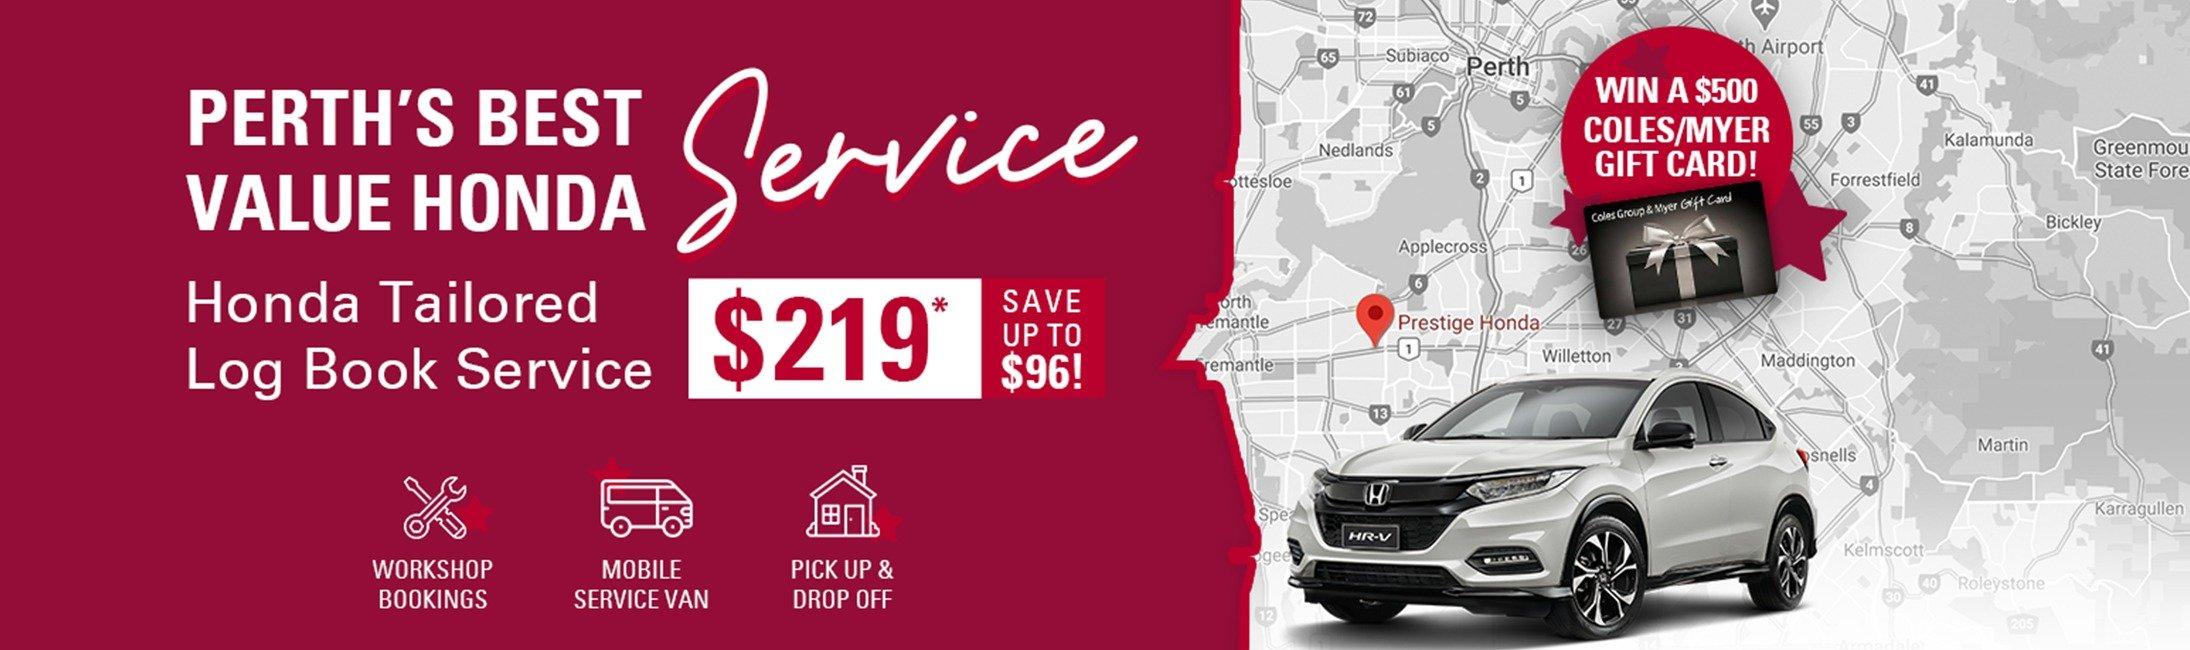 Perth's best value Honda service